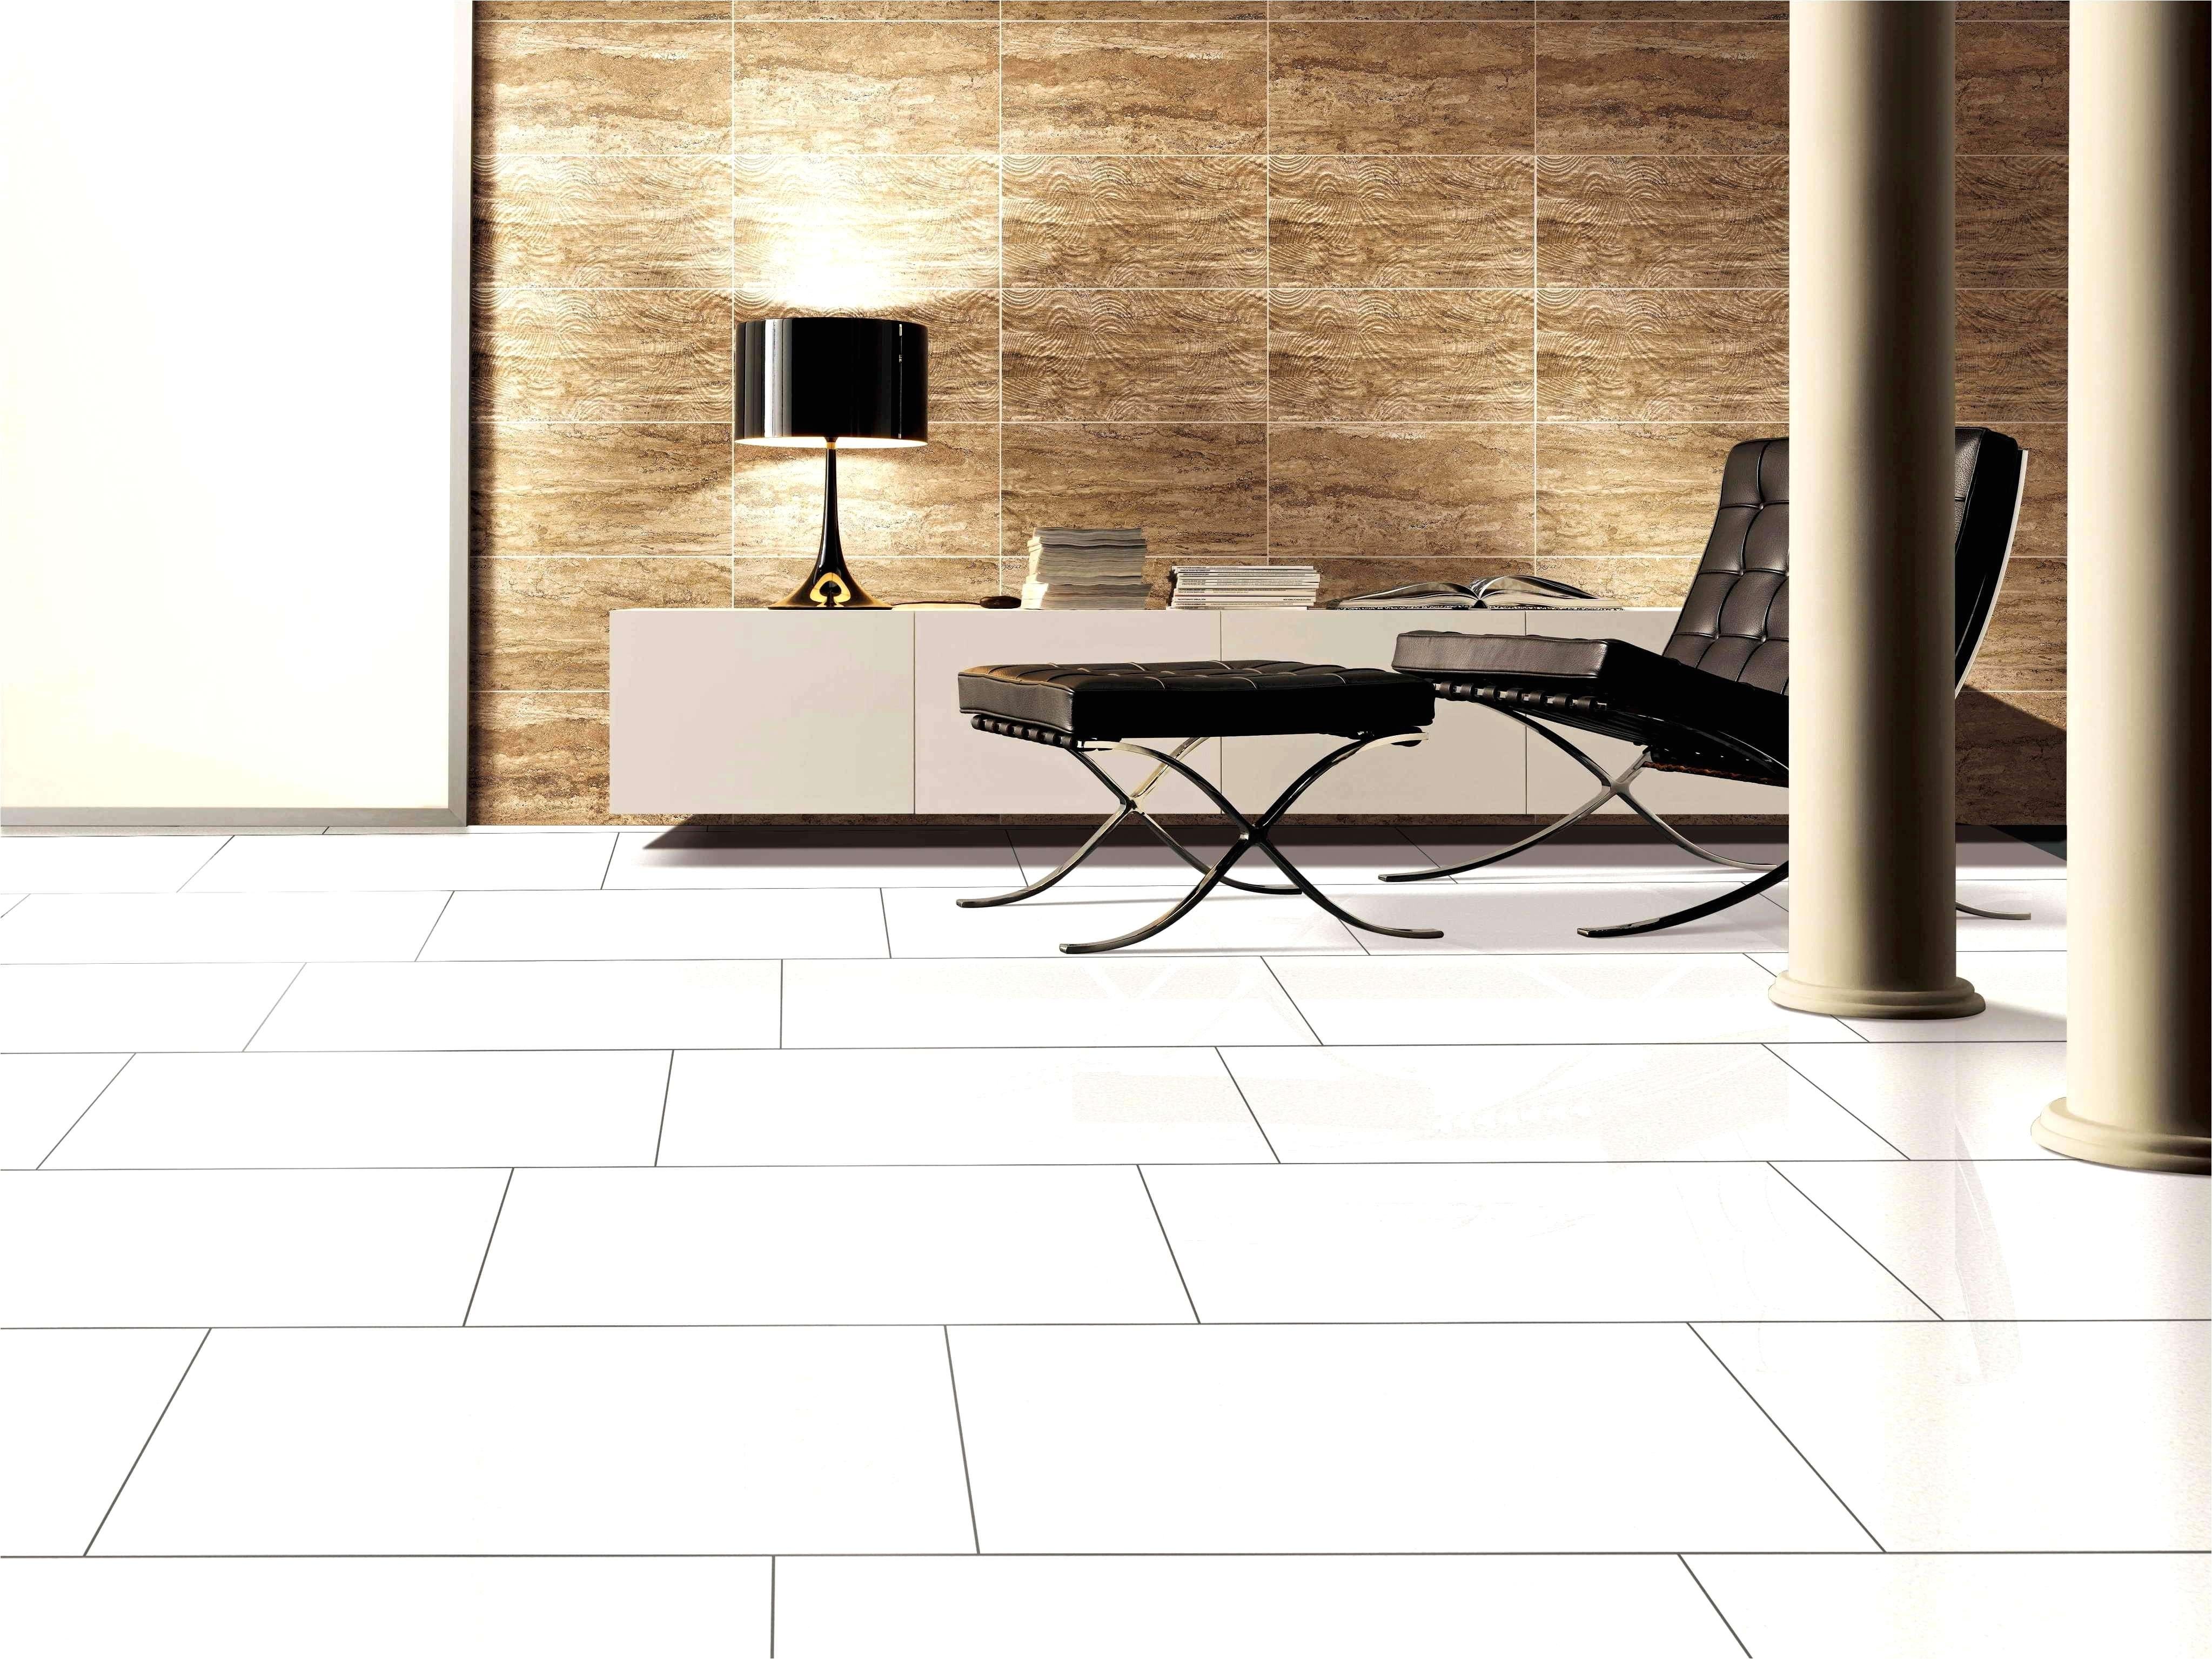 Tile Styles for Bathroom Fresh Unique Shower Floor Tile Ideas New Tile Floor Mosaic Bathroom 0d